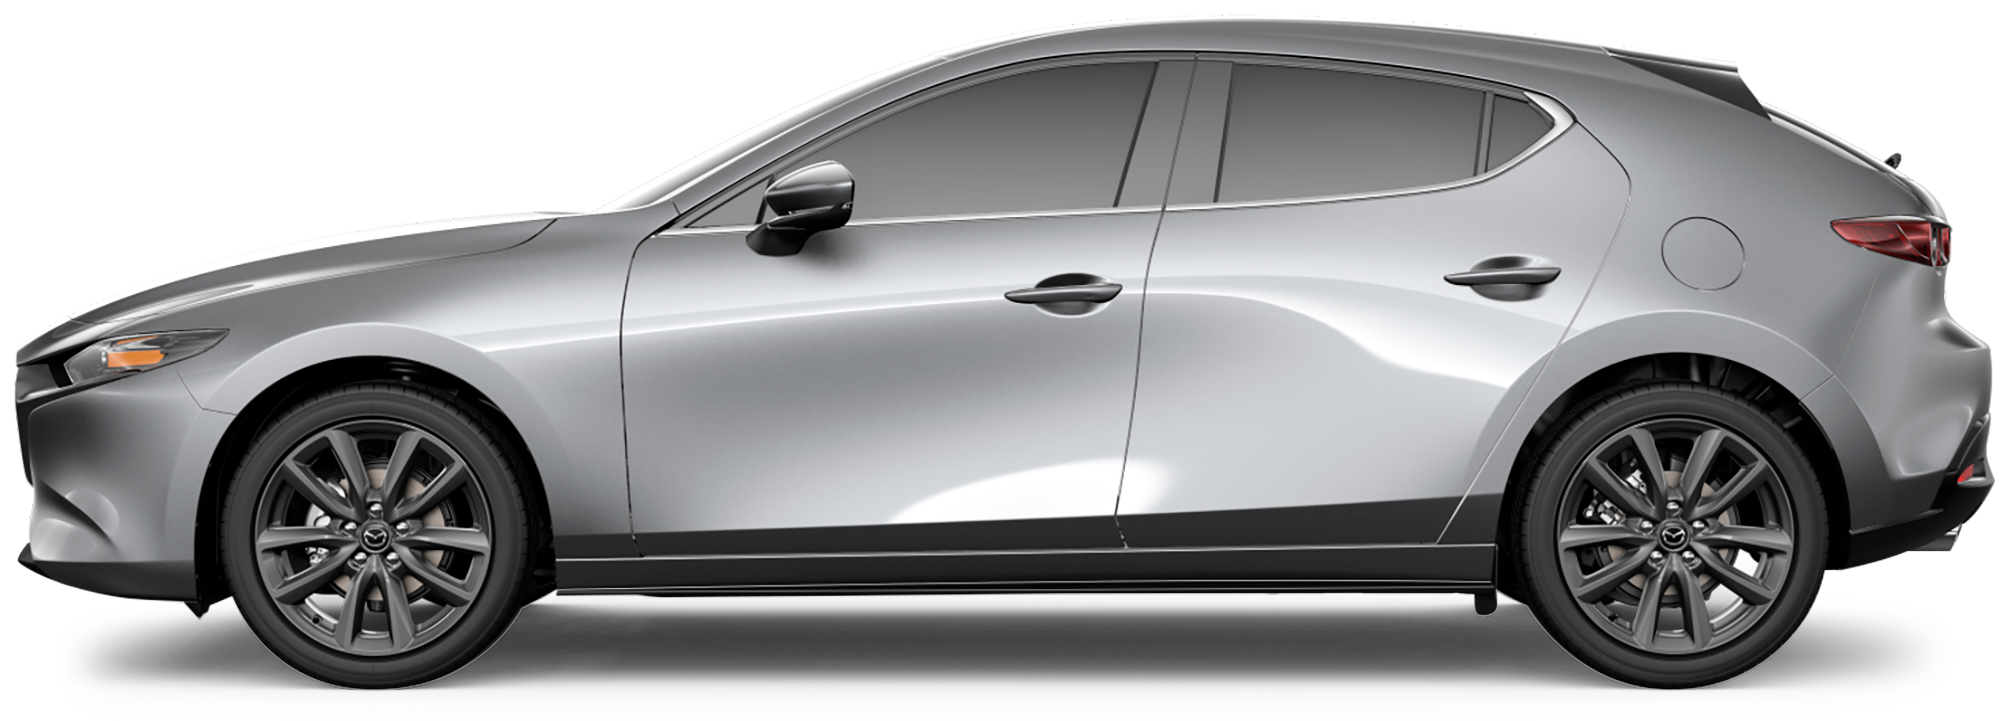 2021 Mazda Mazda3 Hatchback 2.5S